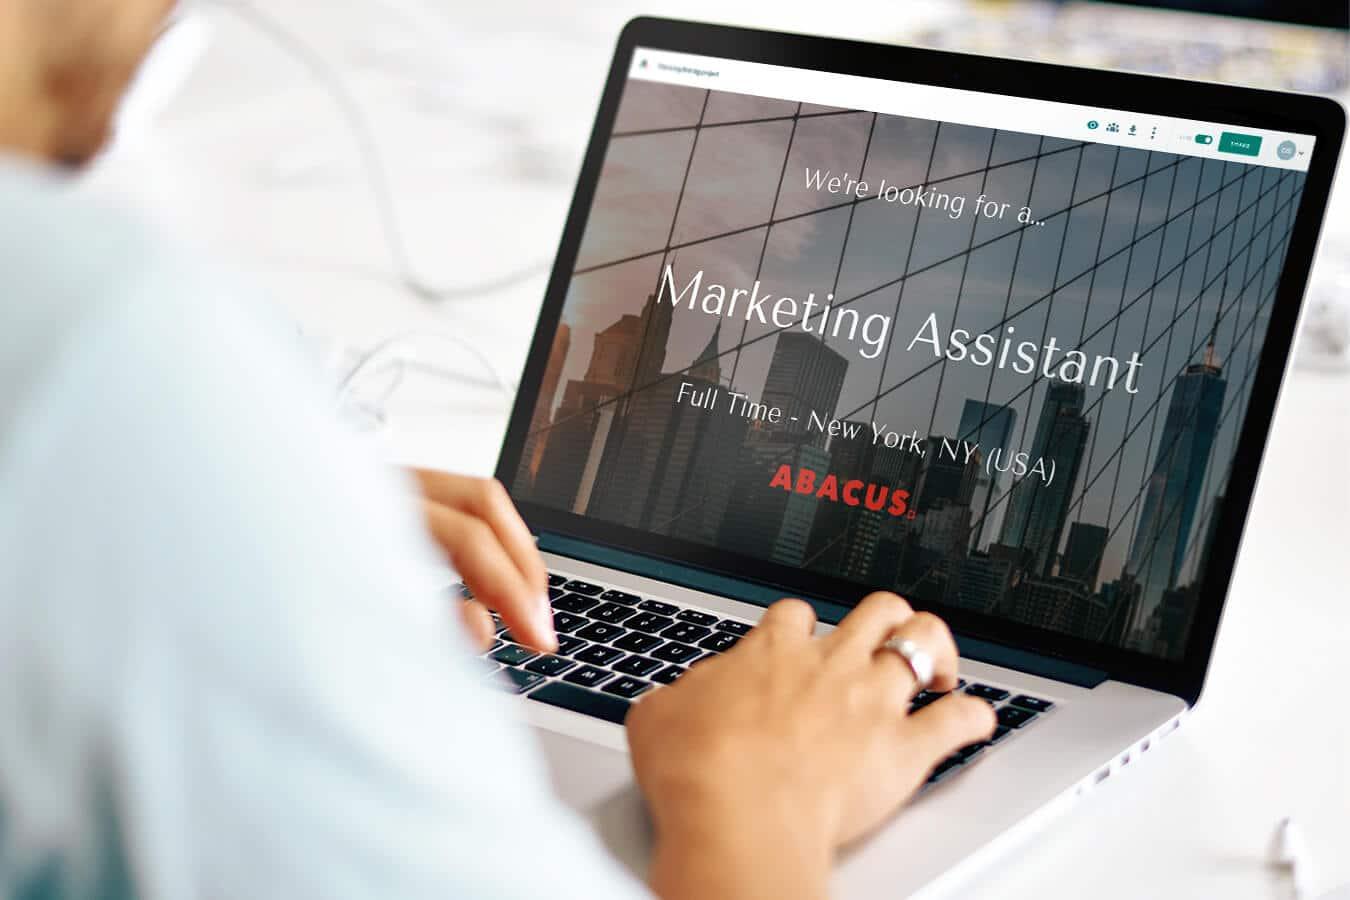 laptop-marketing-assistant-jd